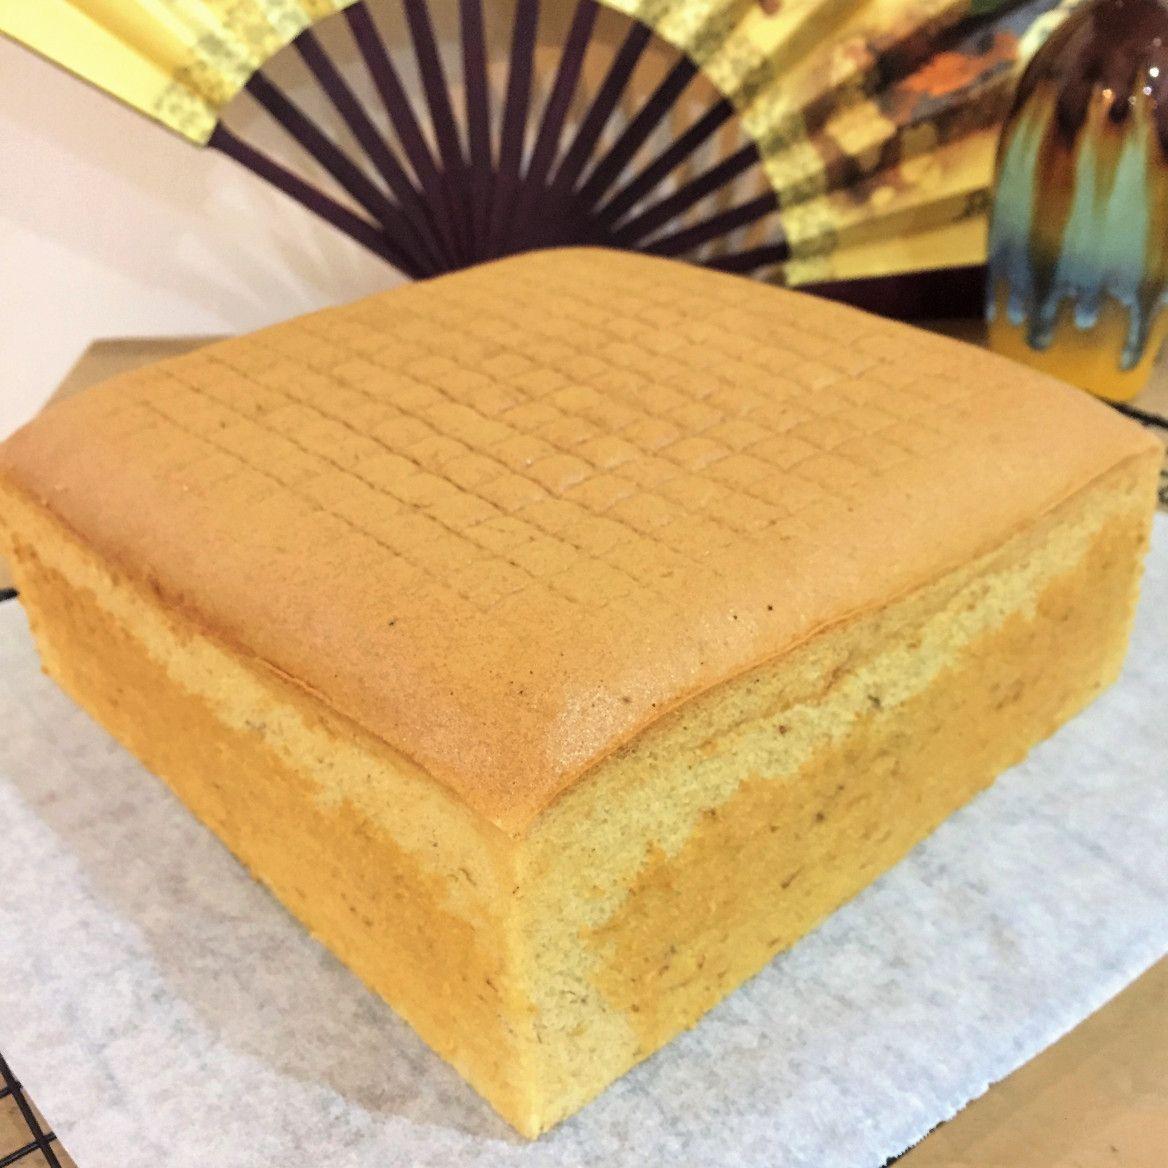 protected blog log in banana sponge cake baking cake banana sponge cake